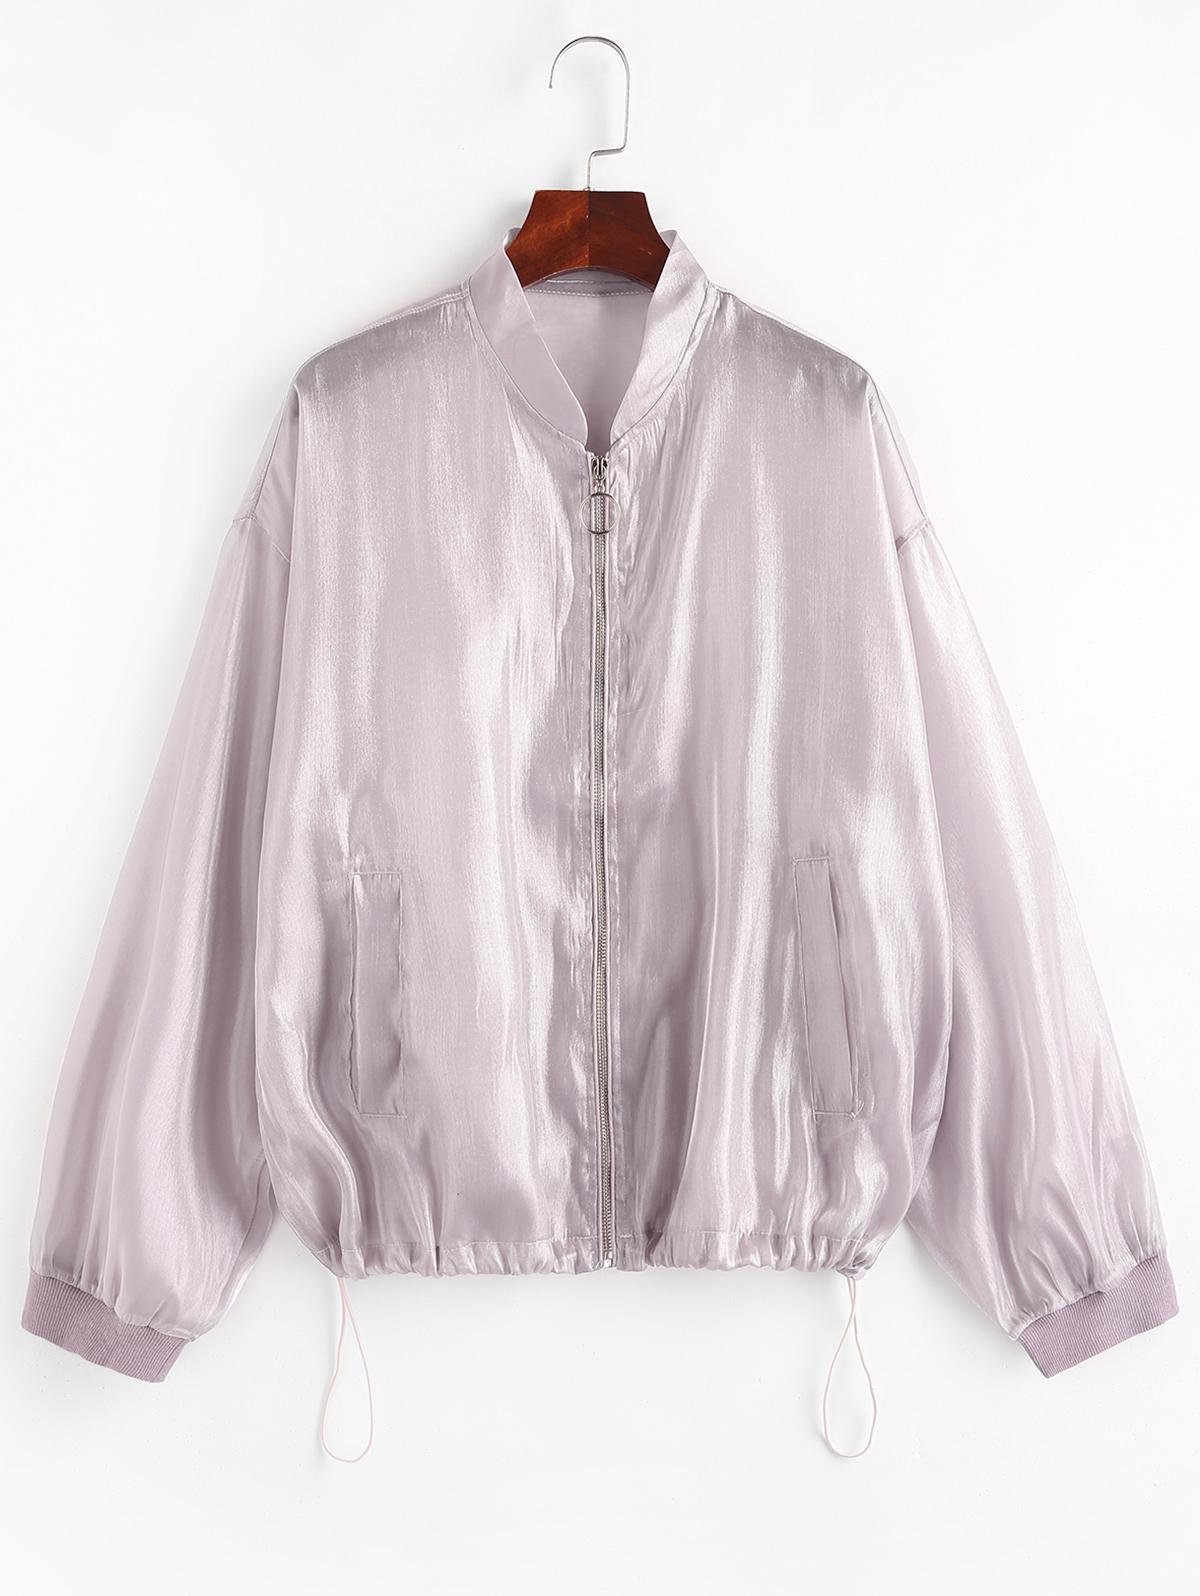 Zip Up Glitter Shiny Jacket